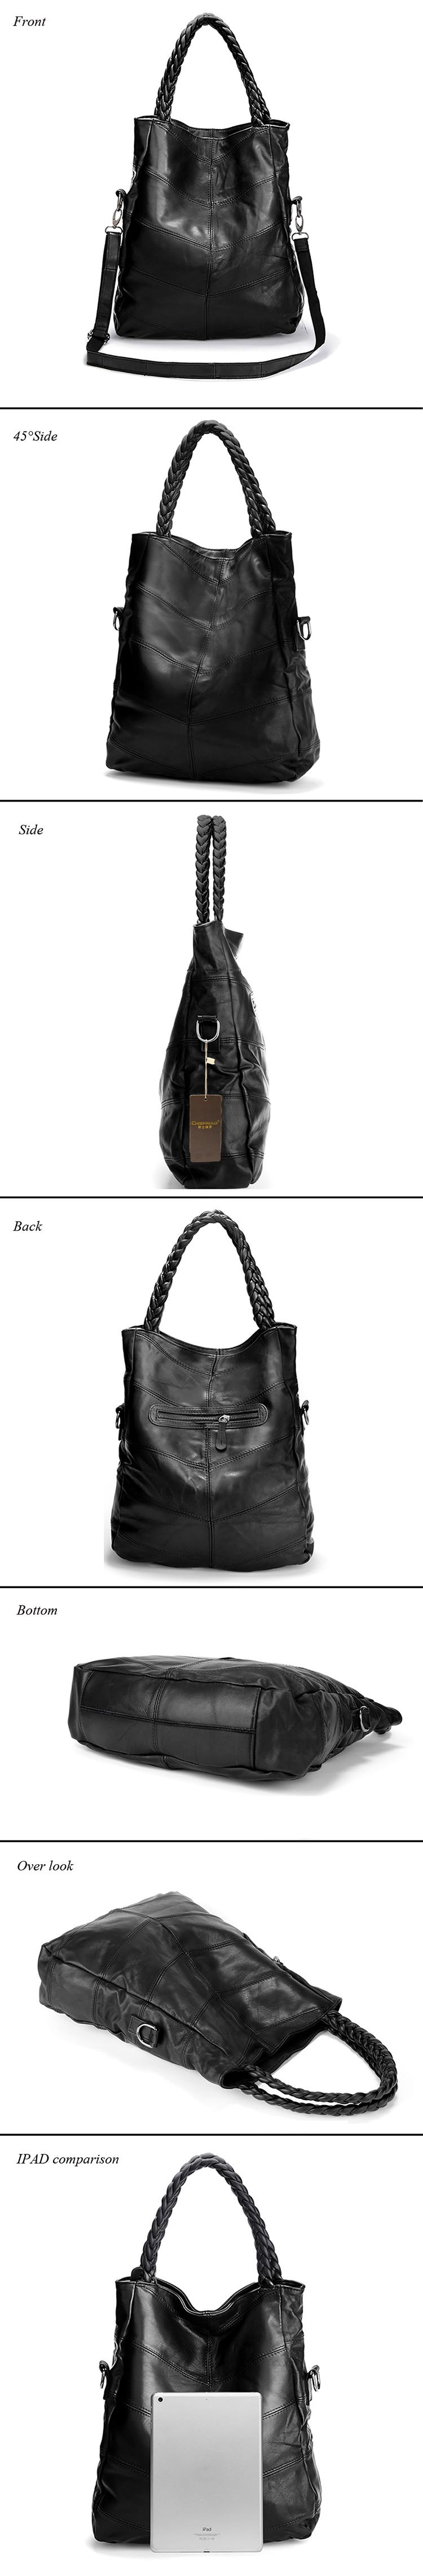 woman-handbag1_021